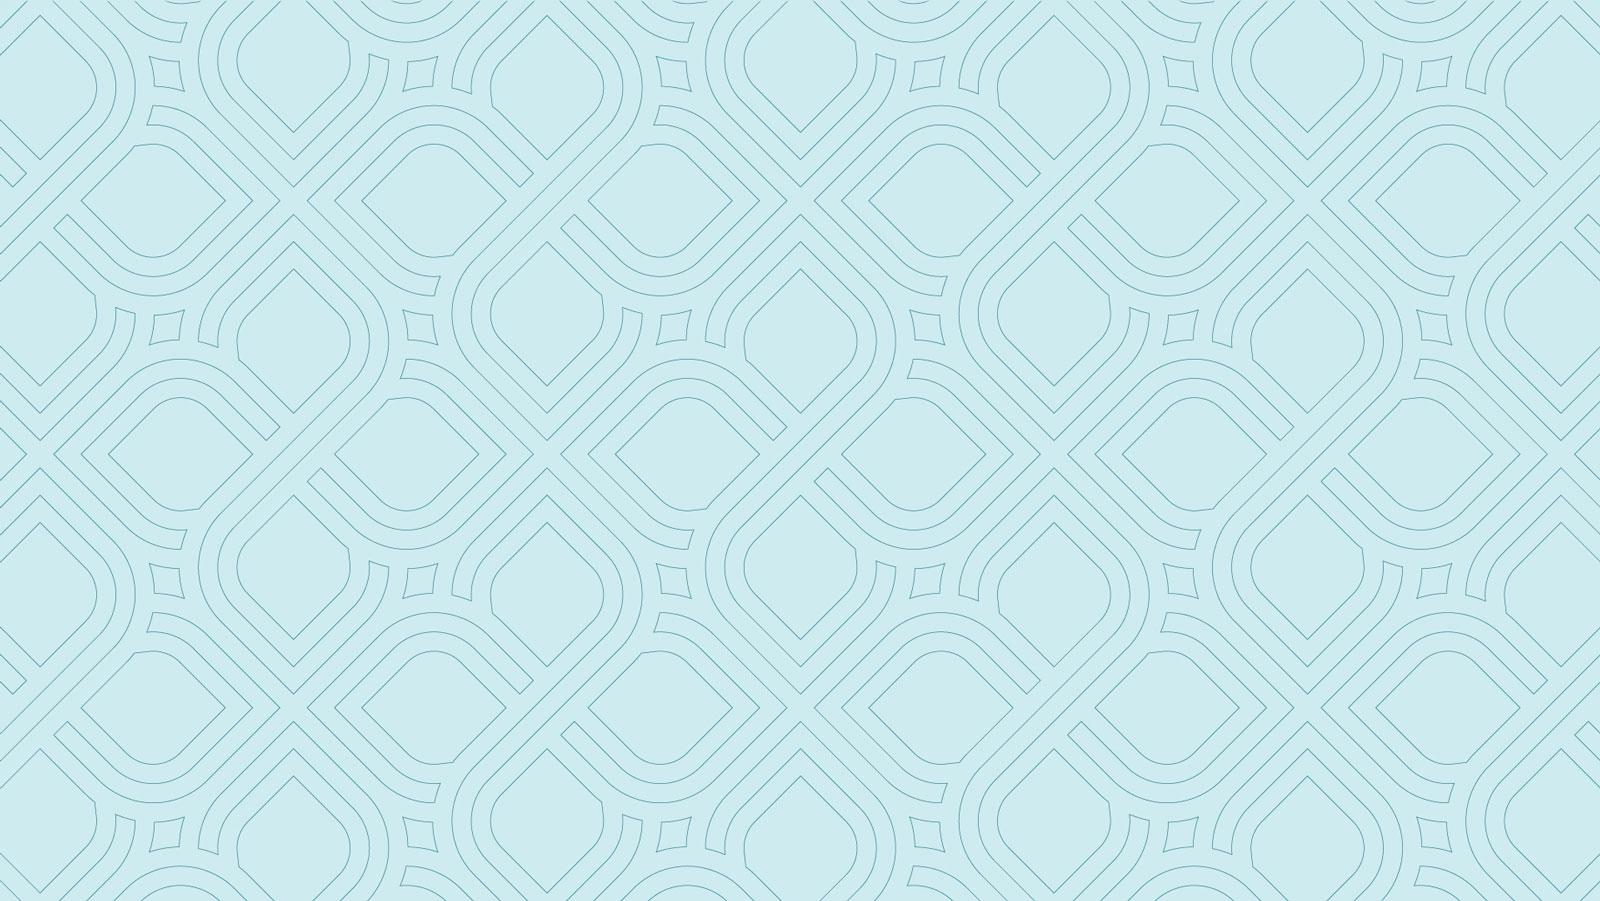 nakatsui_pattern.jpg